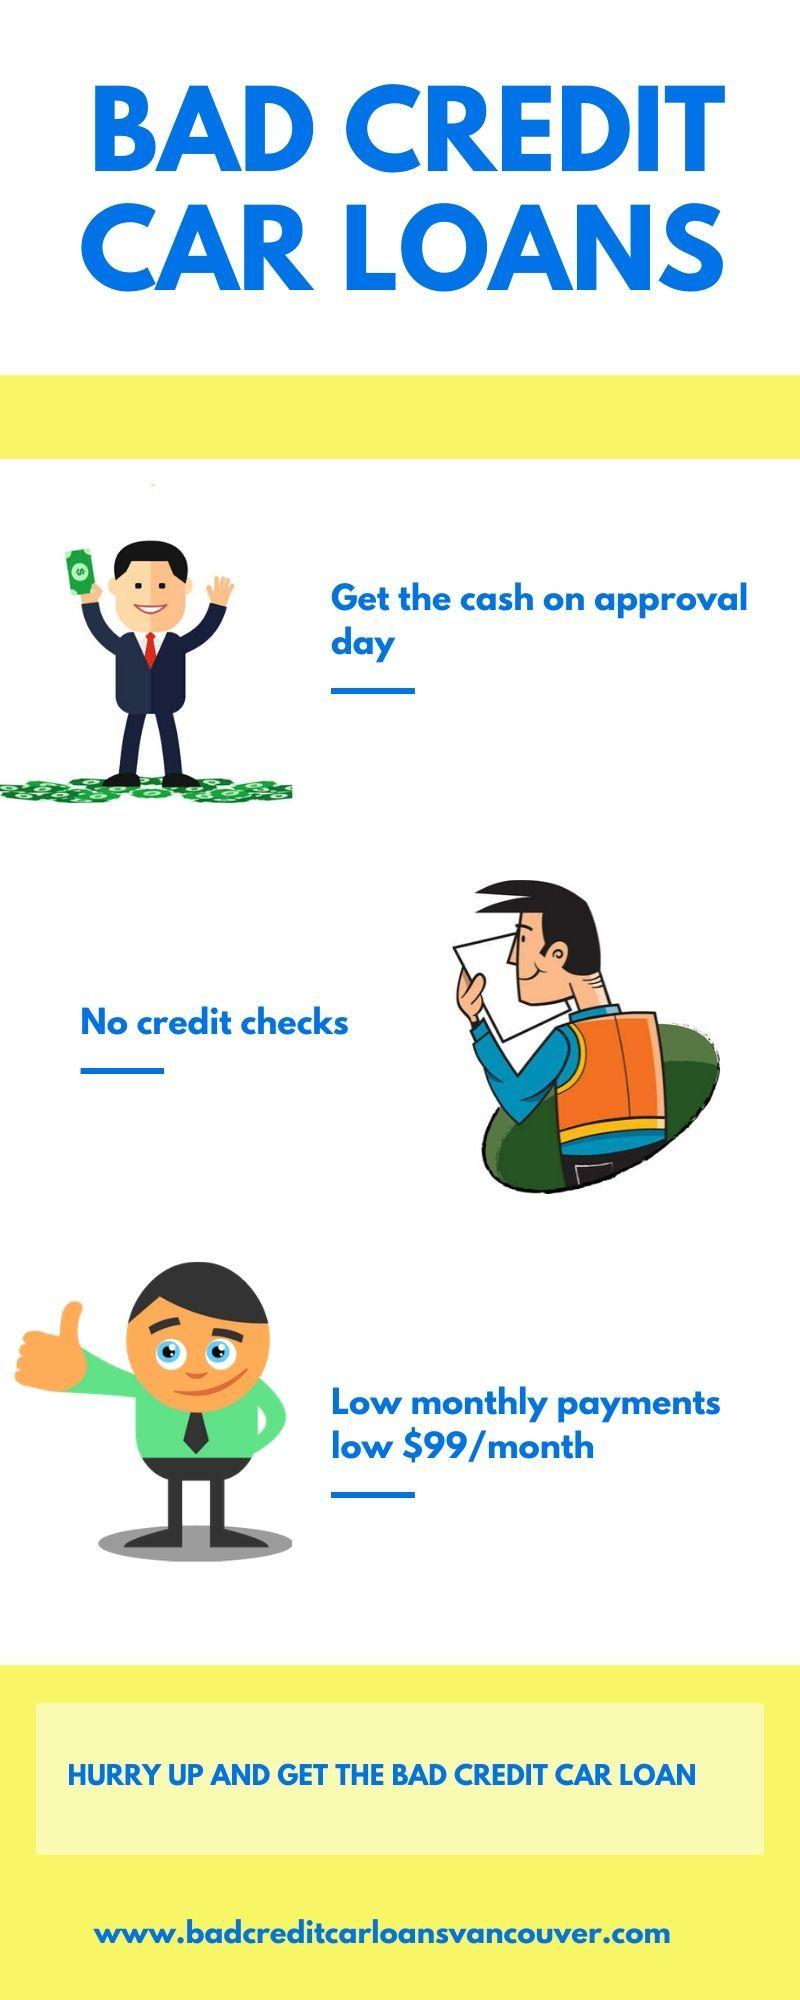 Worried About Poor Credit? Get Bad Credit Car Loans Surrey